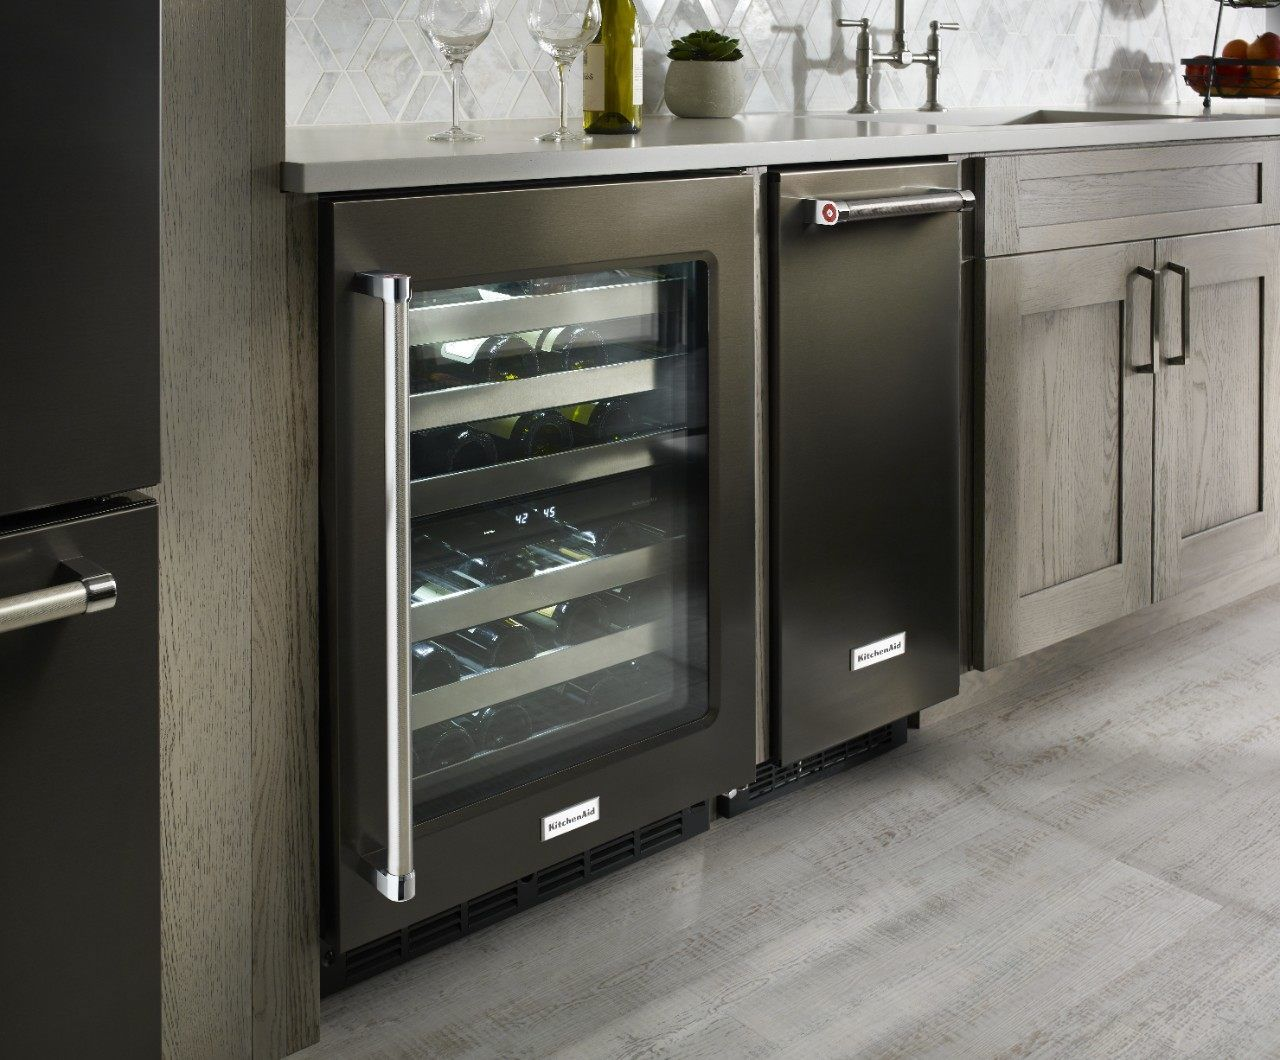 Undercounter Fridge Options From Kitchenaid Kitchen Aid Kitchen Aid Appliances Wine Fridge